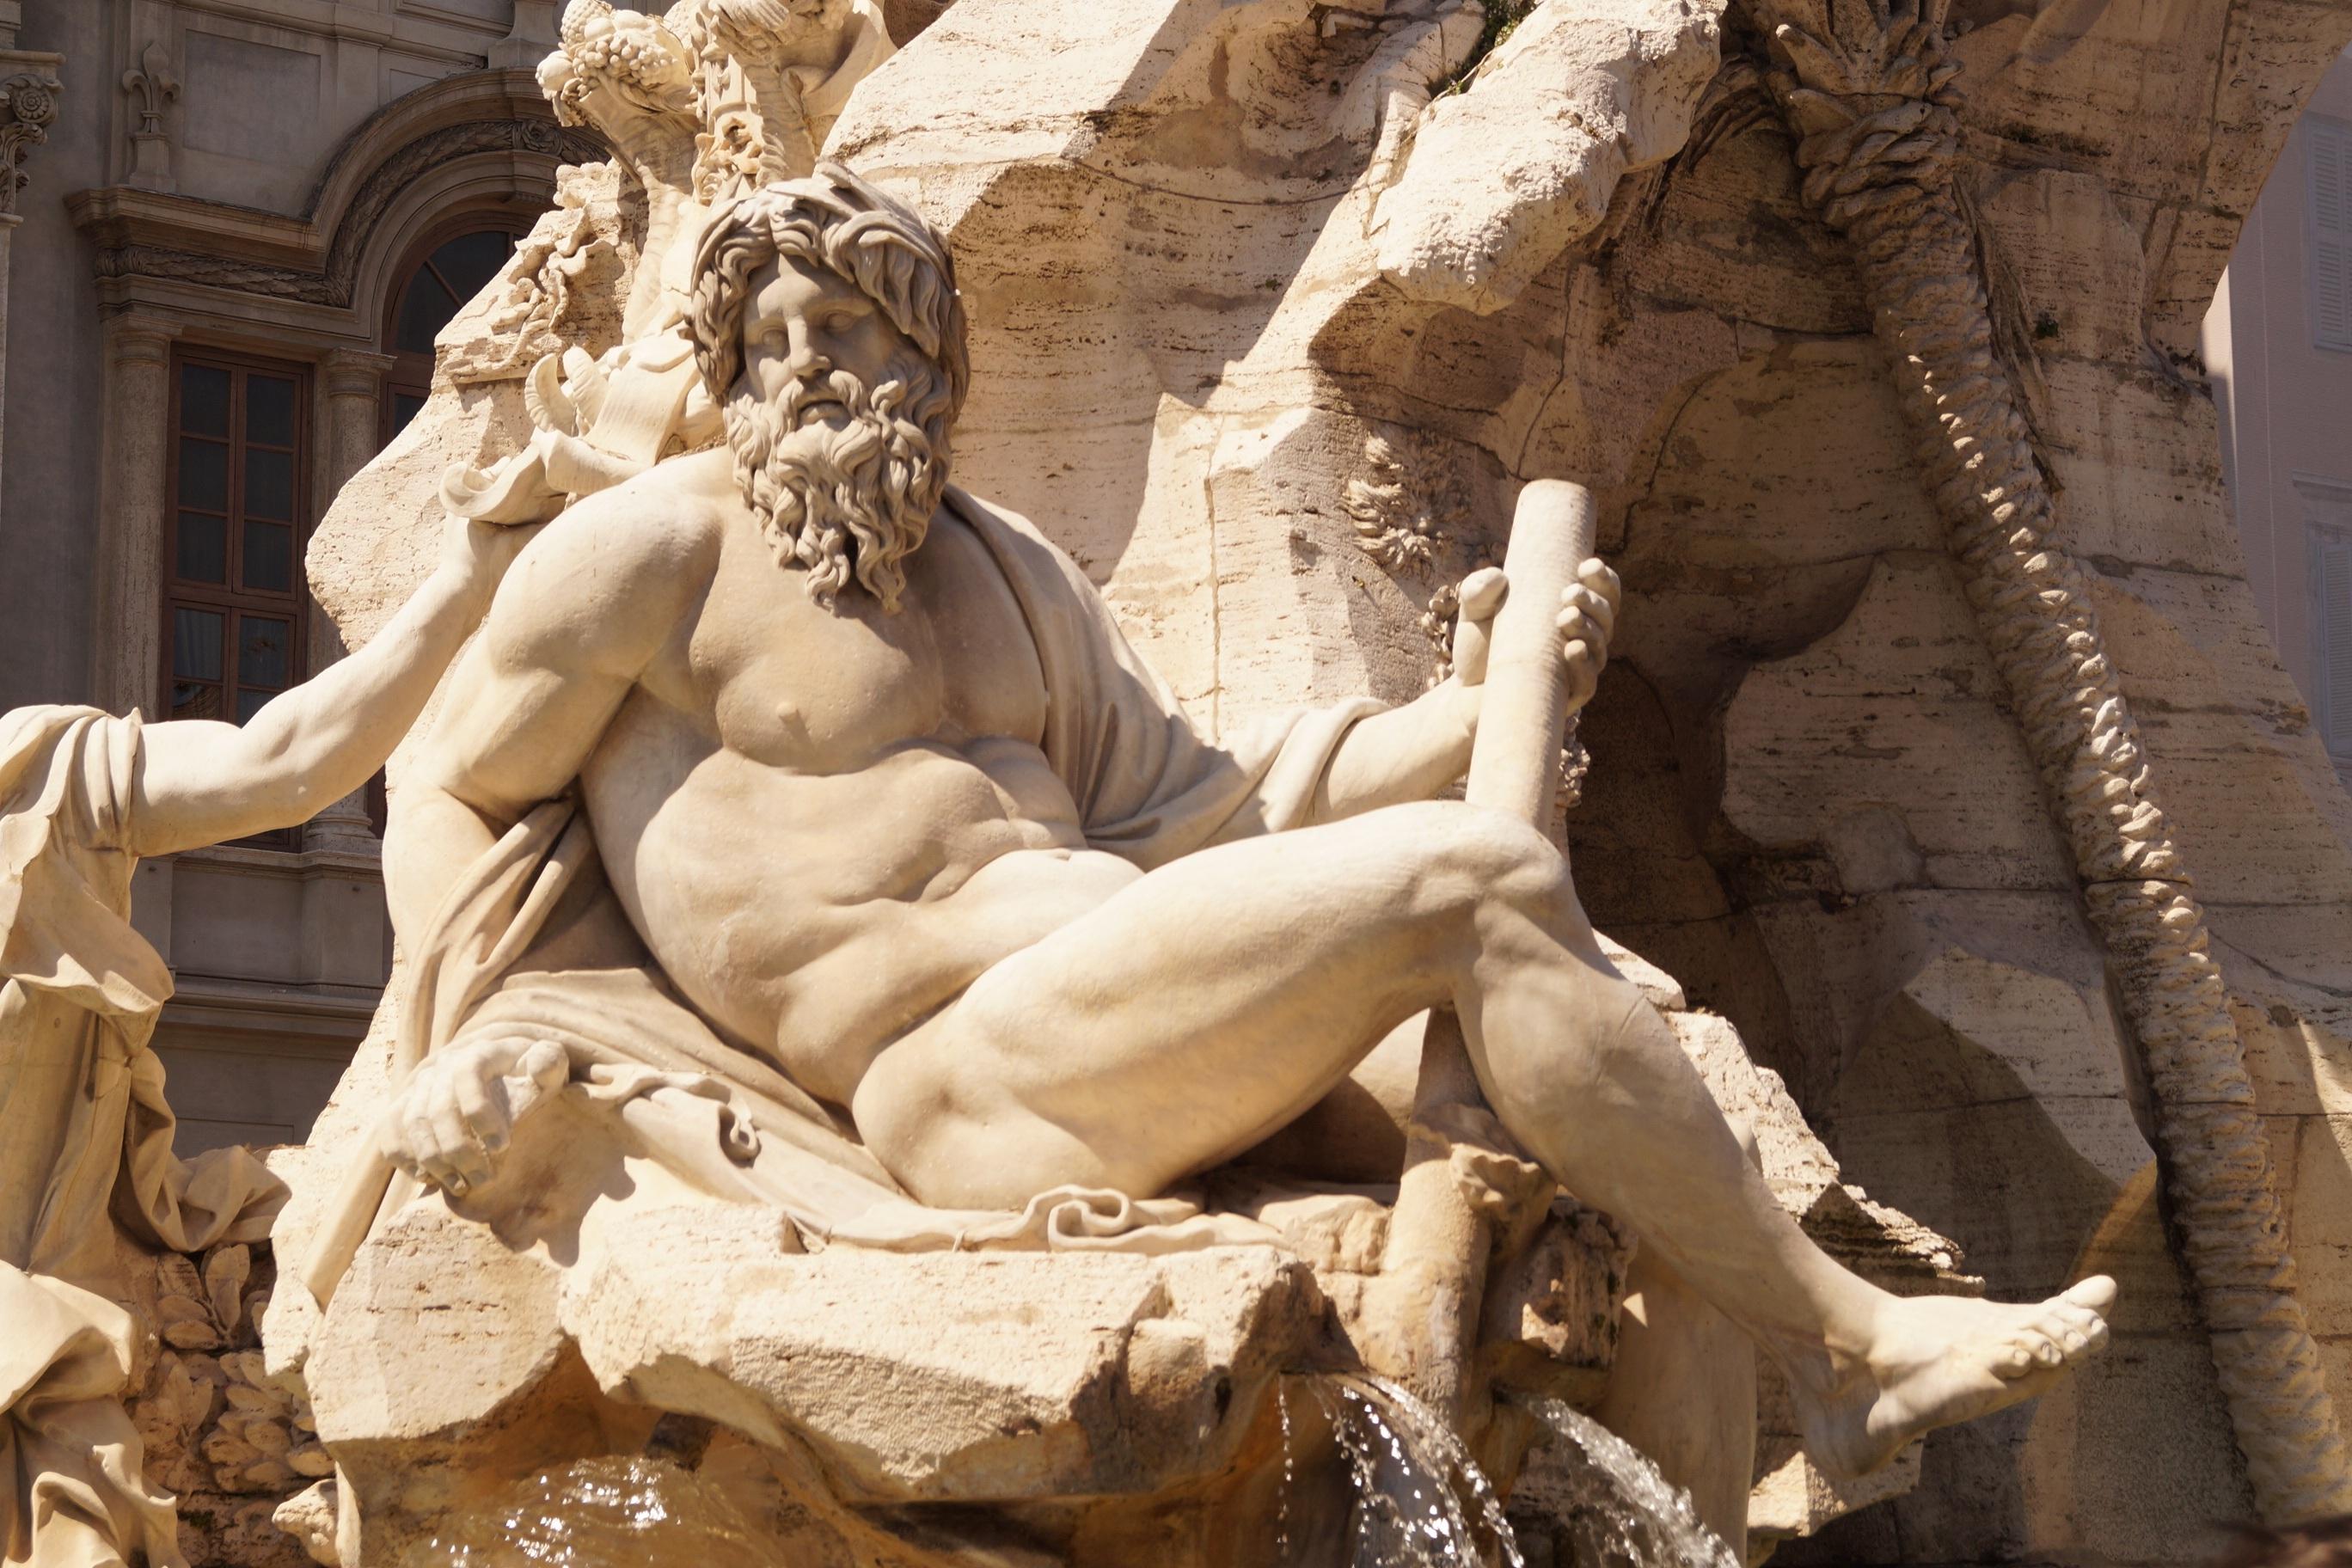 утра картинки римских статуй этом видео мастер-классе